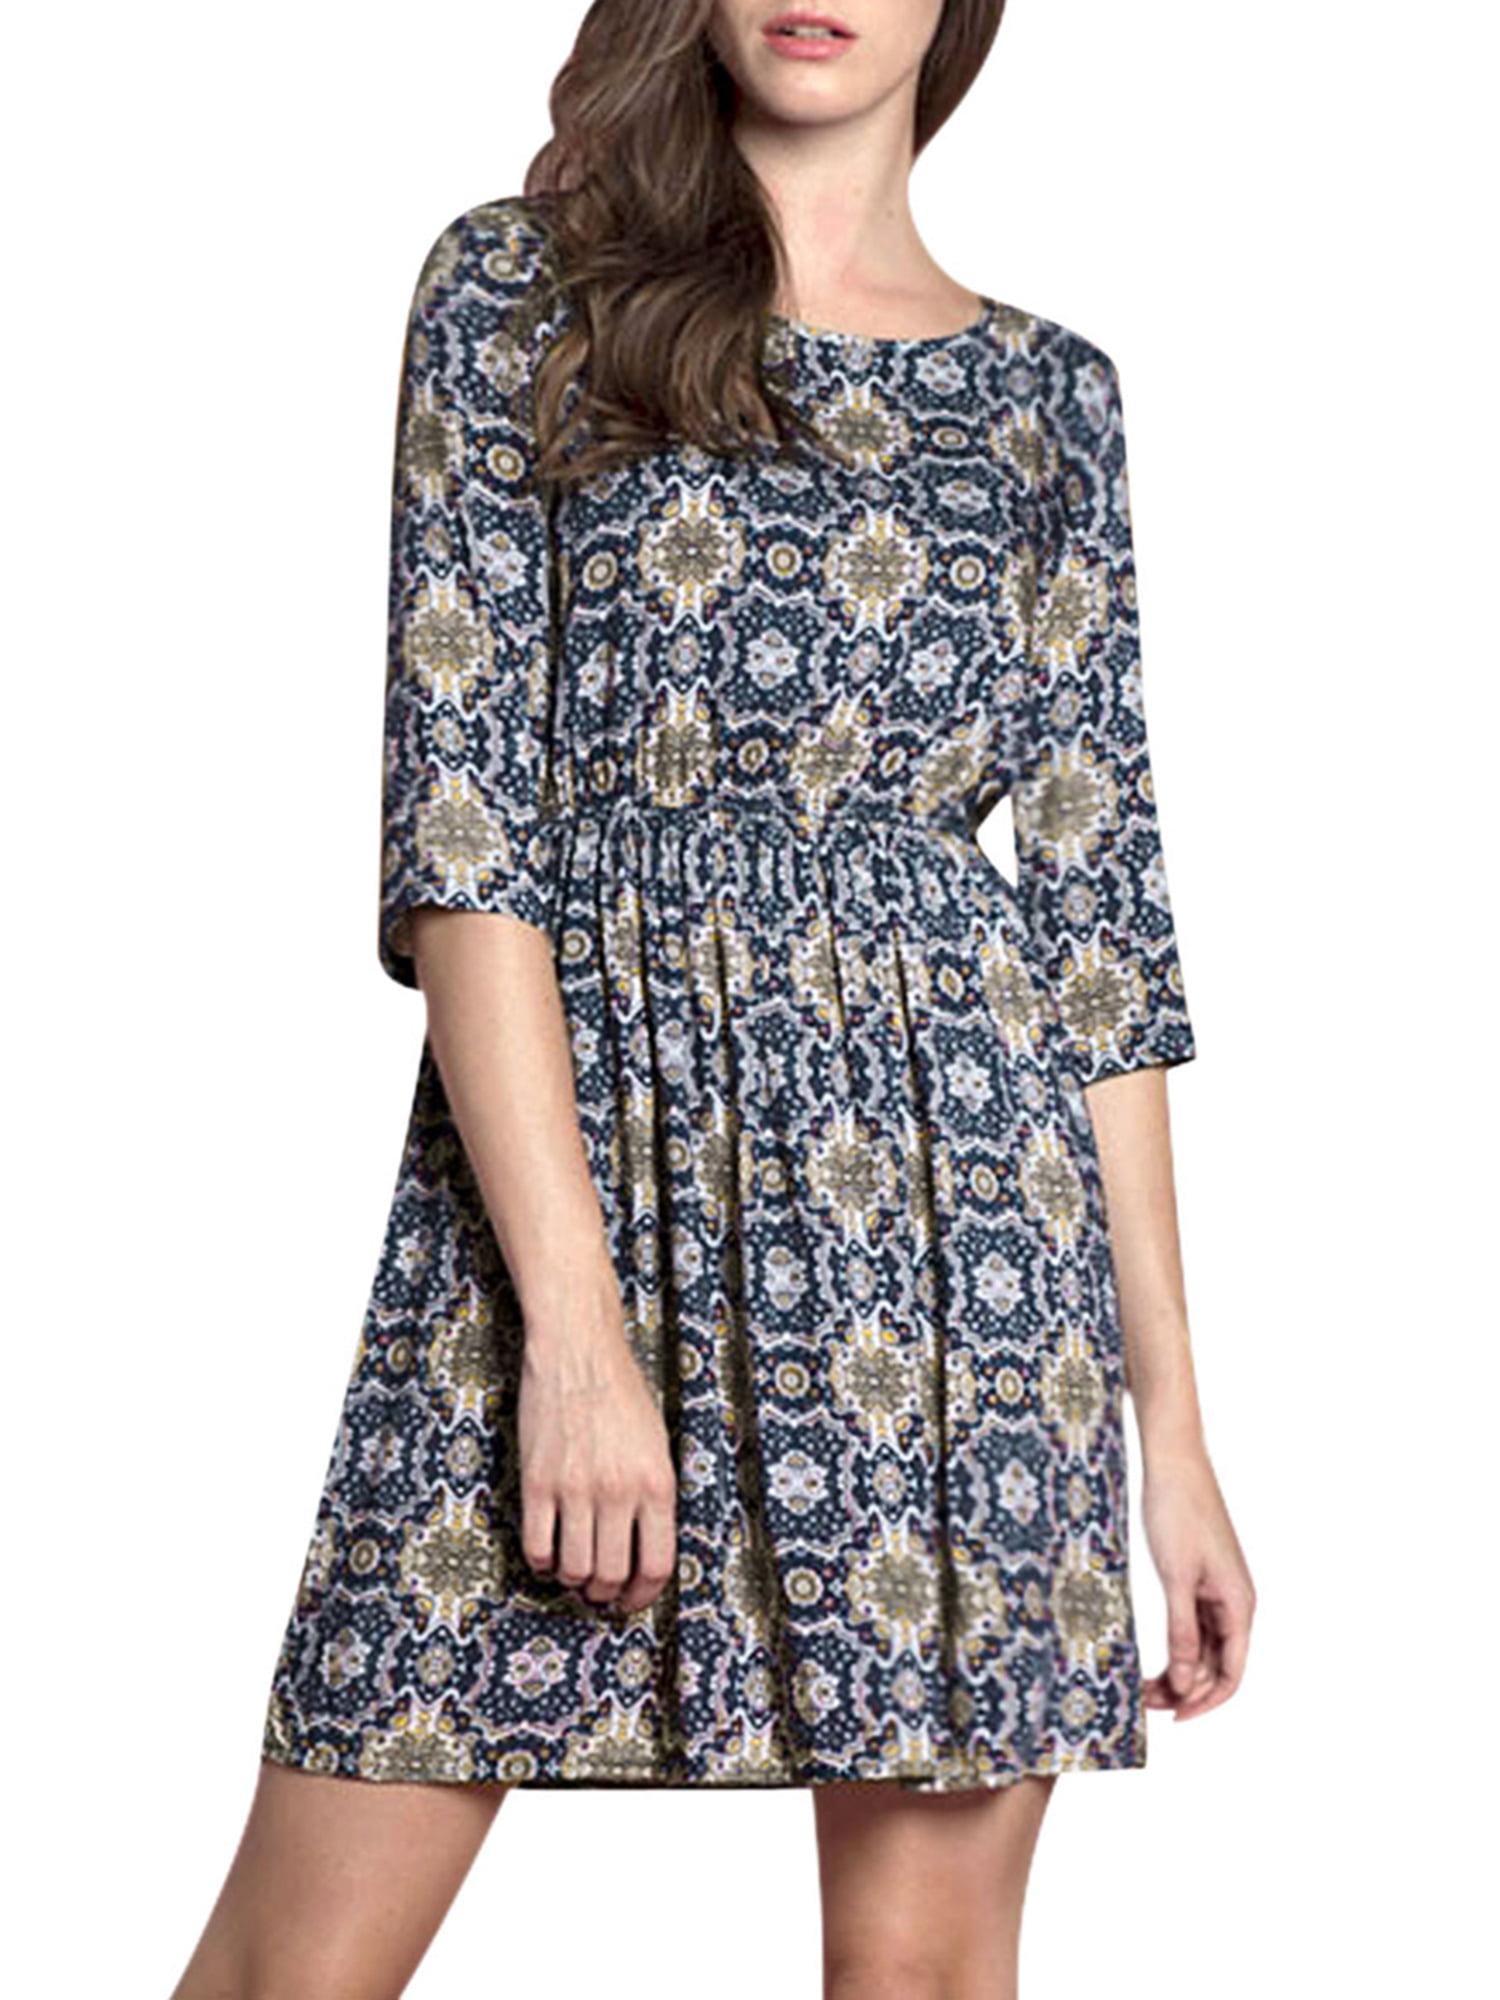 Women's Floral Prints 3/4 Sleeves Elastic Waist A Line Dress Blue (Size L / 12)